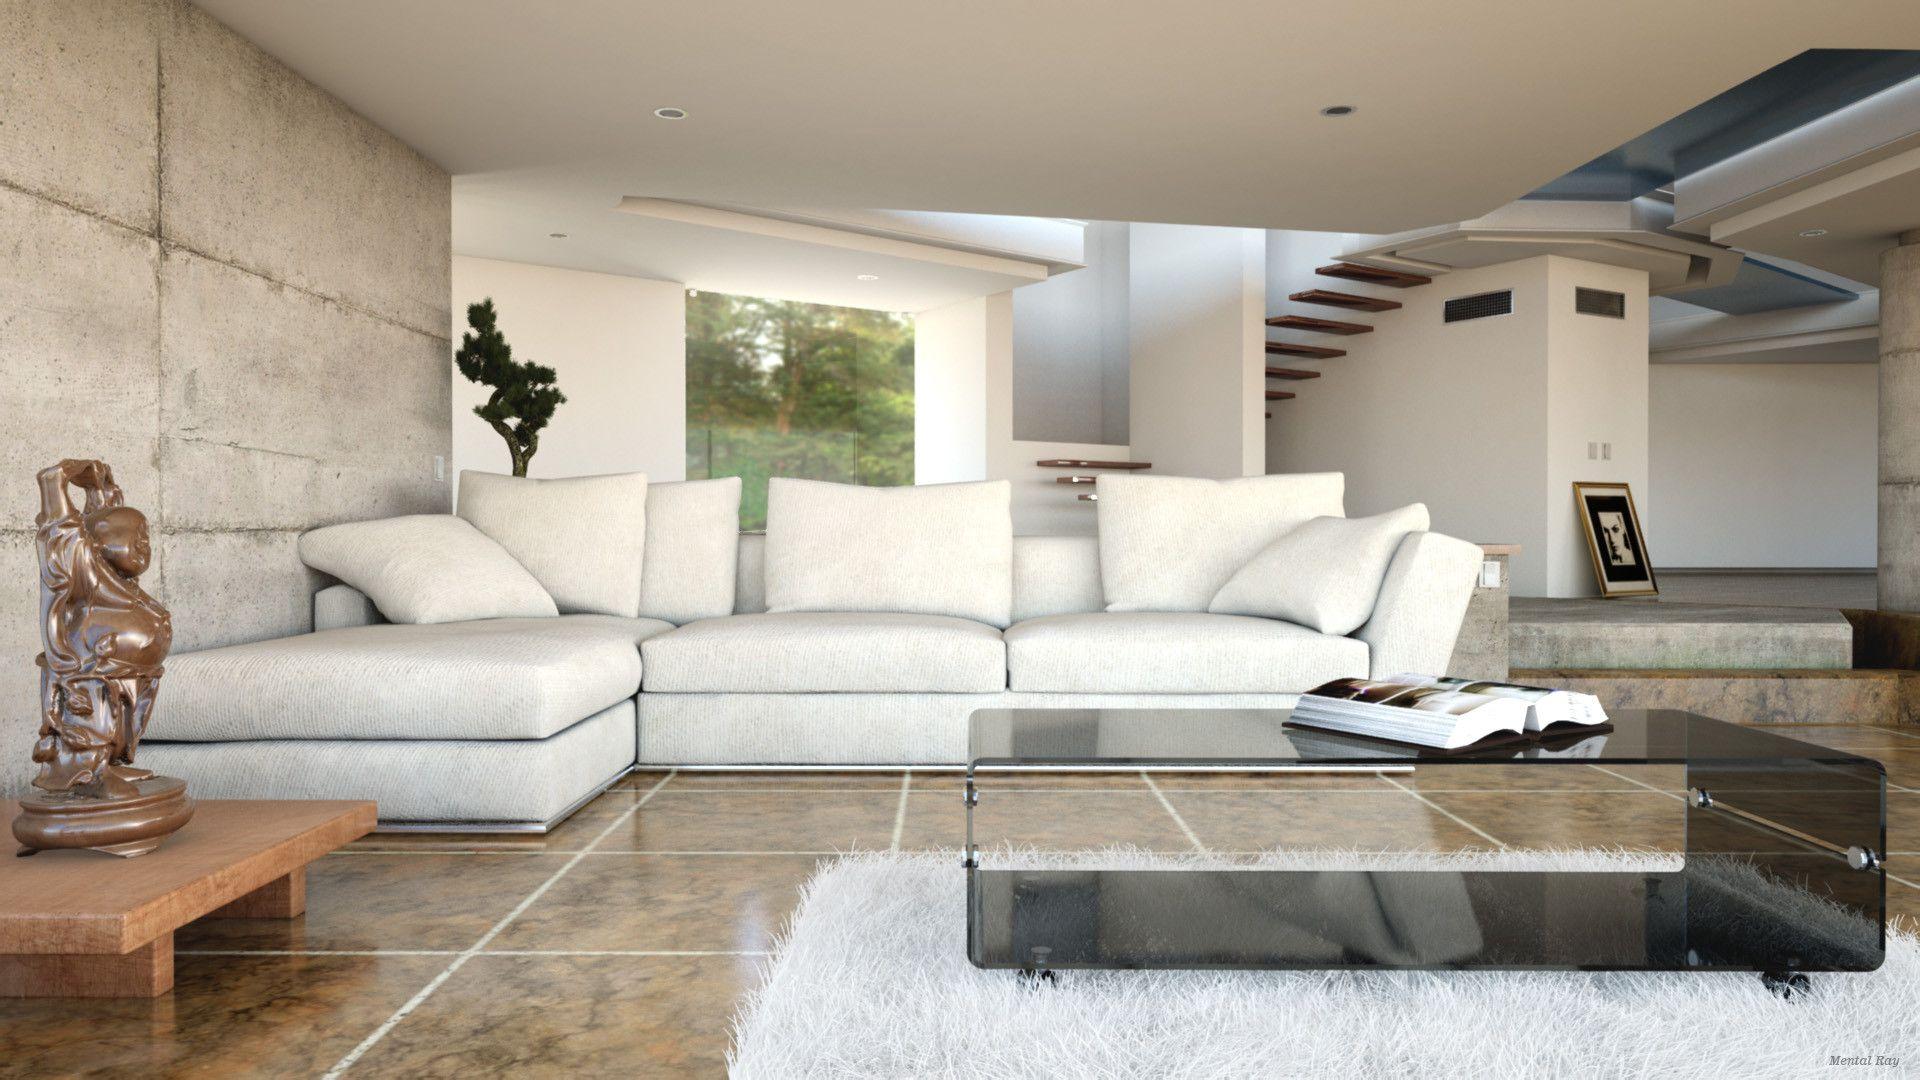 Living Room 3D Design Modern Realistic Interior Living Room 3D Model  3D Model  3D